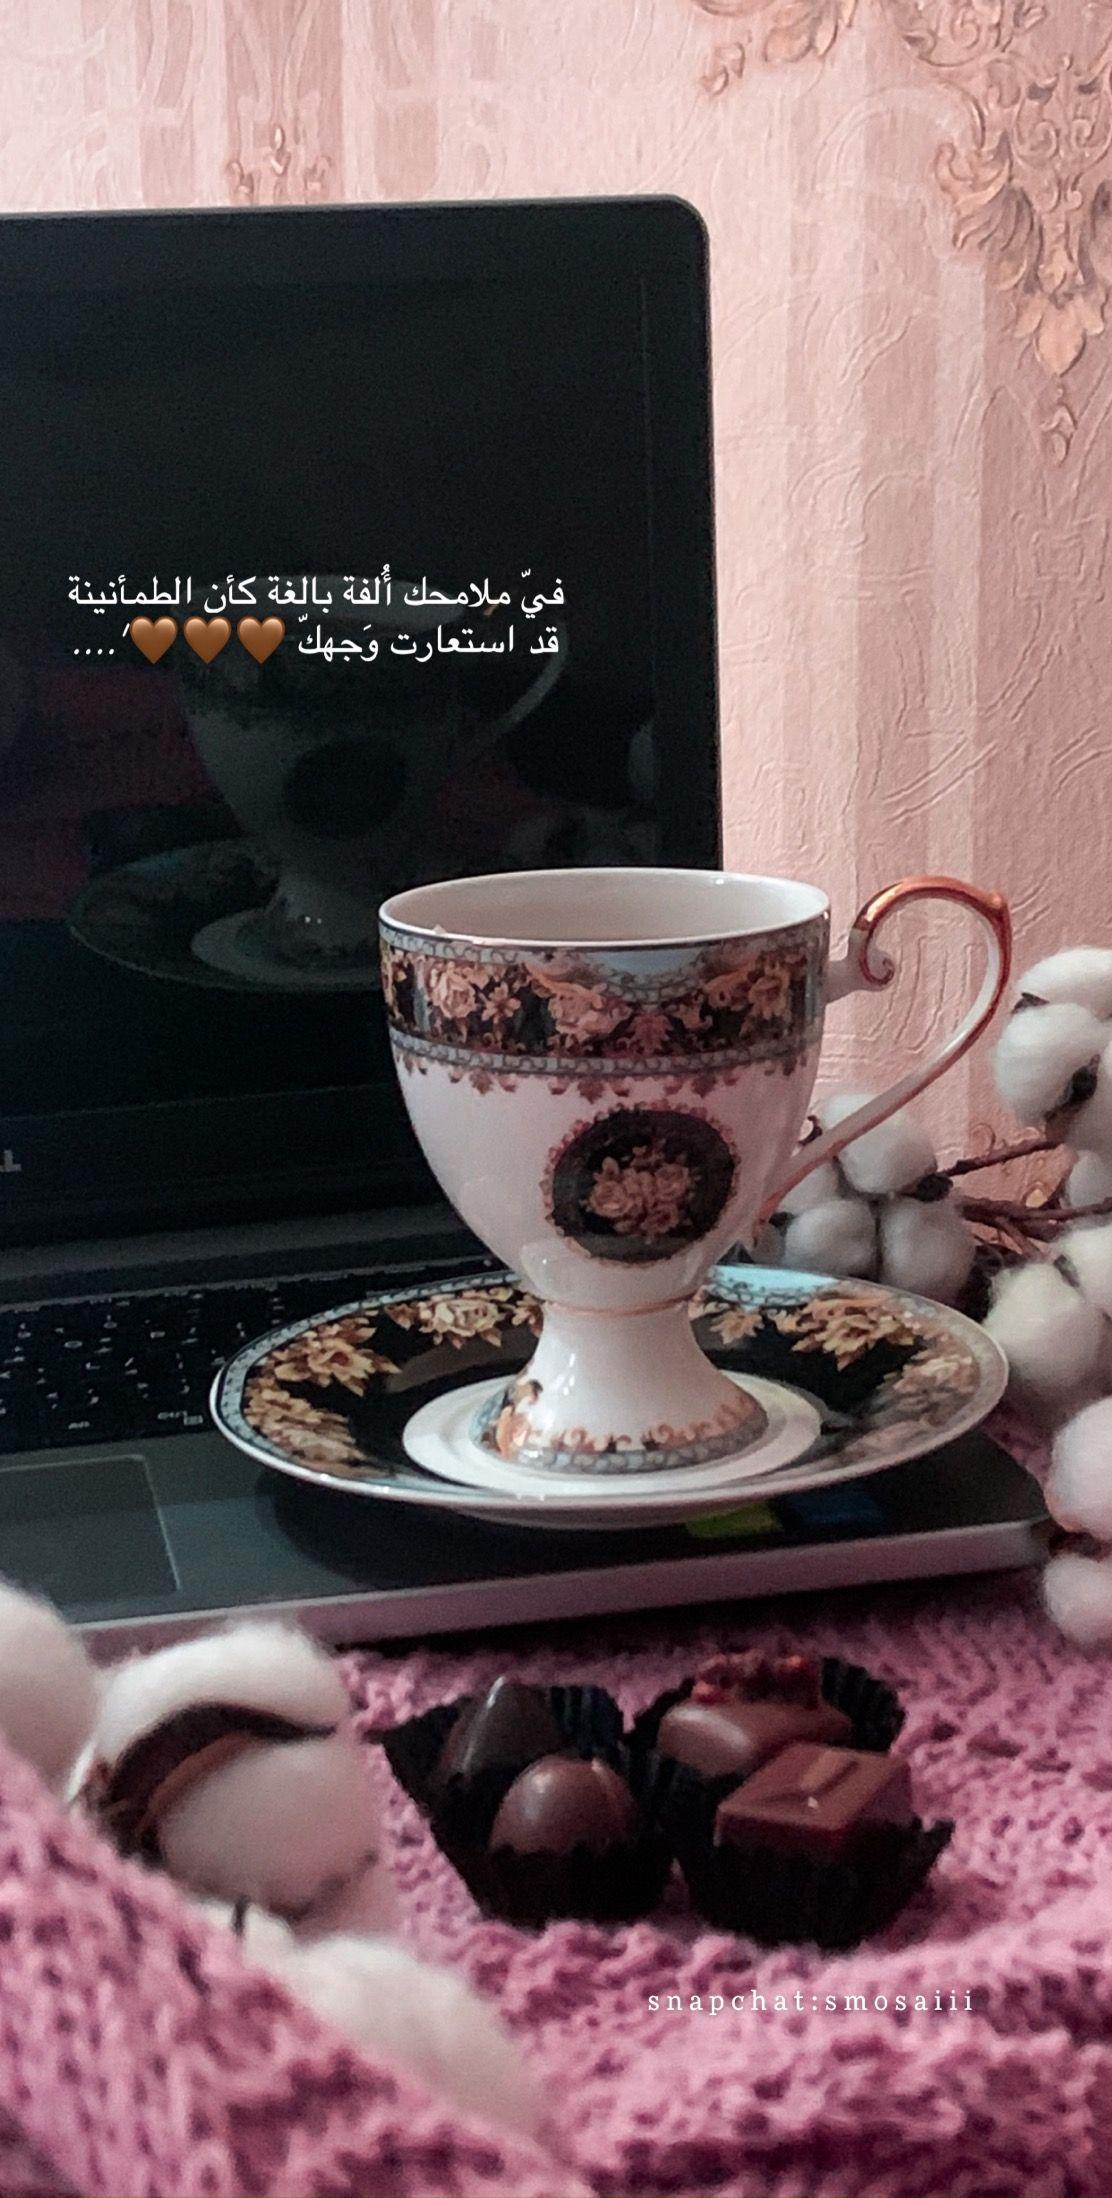 Snap Smosaiii Insta Smosaii Love Quotes Wallpaper Beautiful Quran Quotes Funny Arabic Quotes